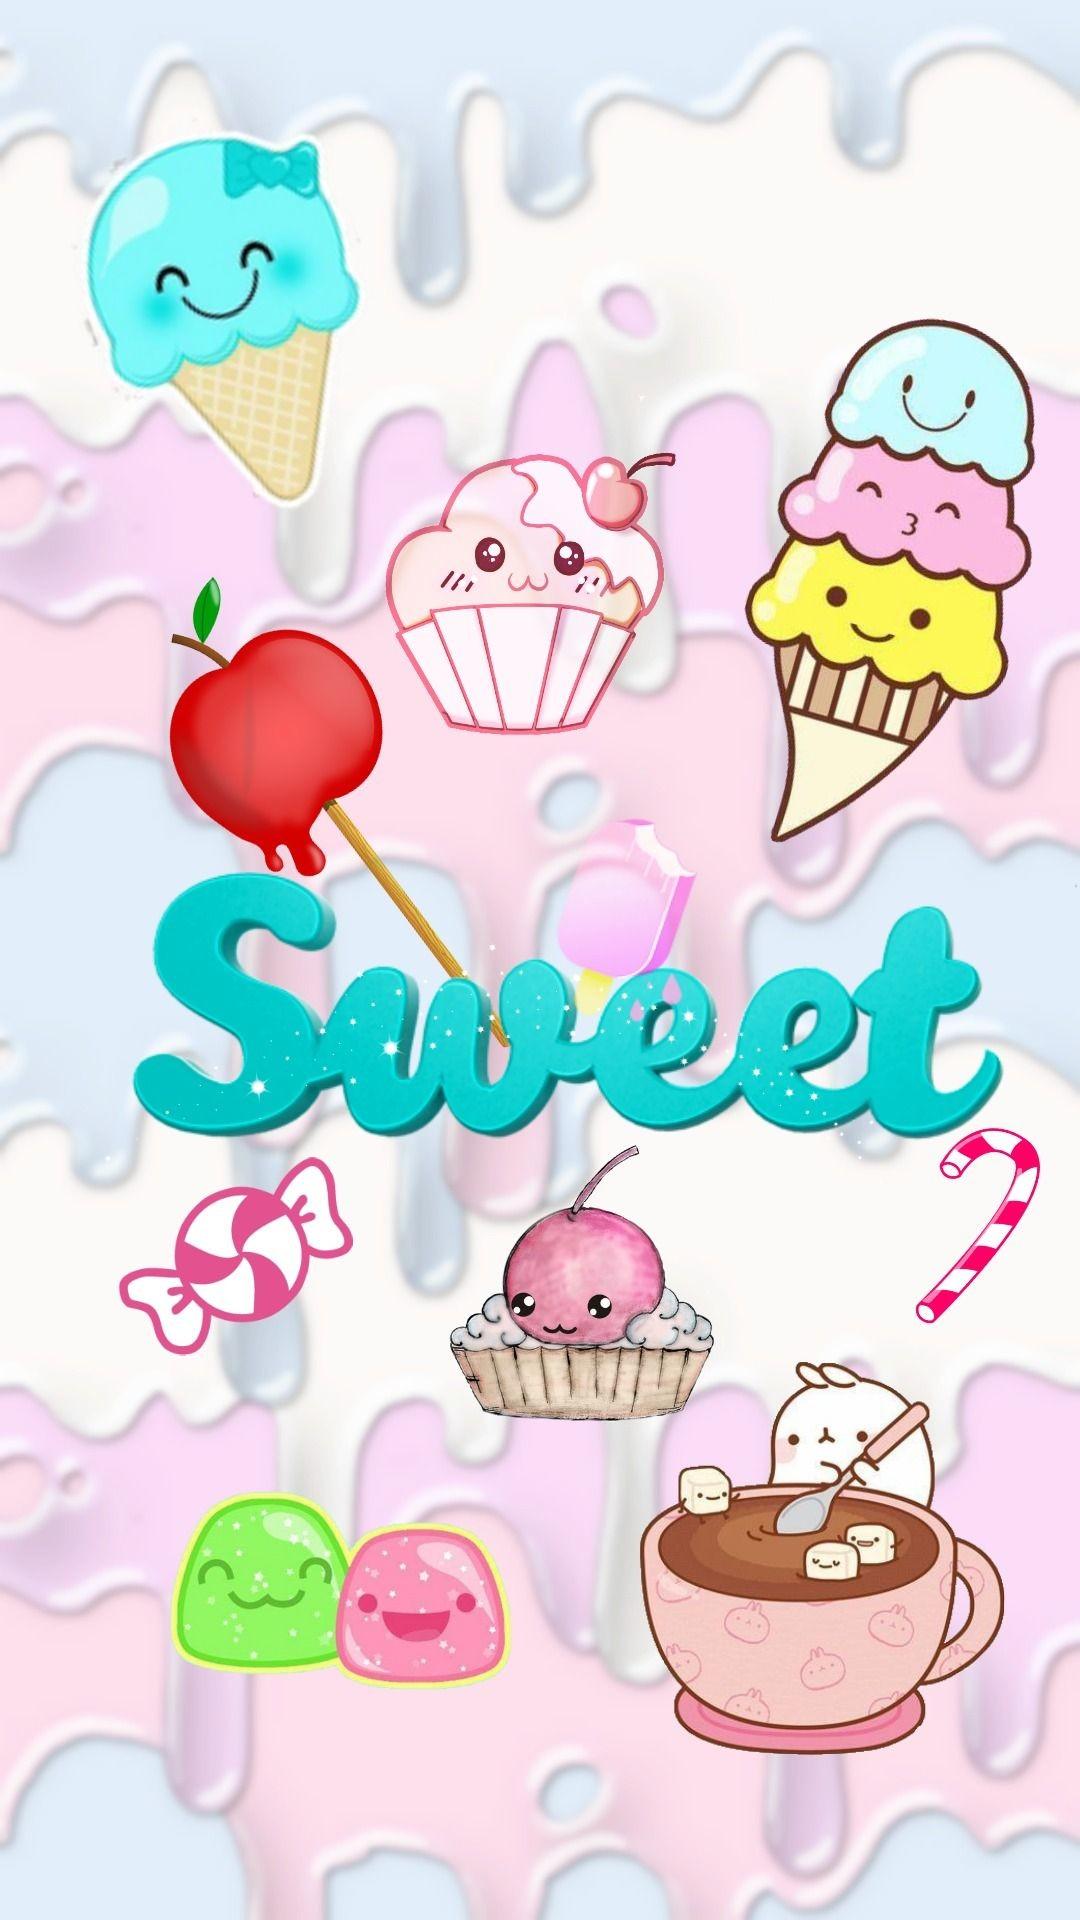 Res: 1080x1920, sweet cute wallpaper for phone - kawaii iphone